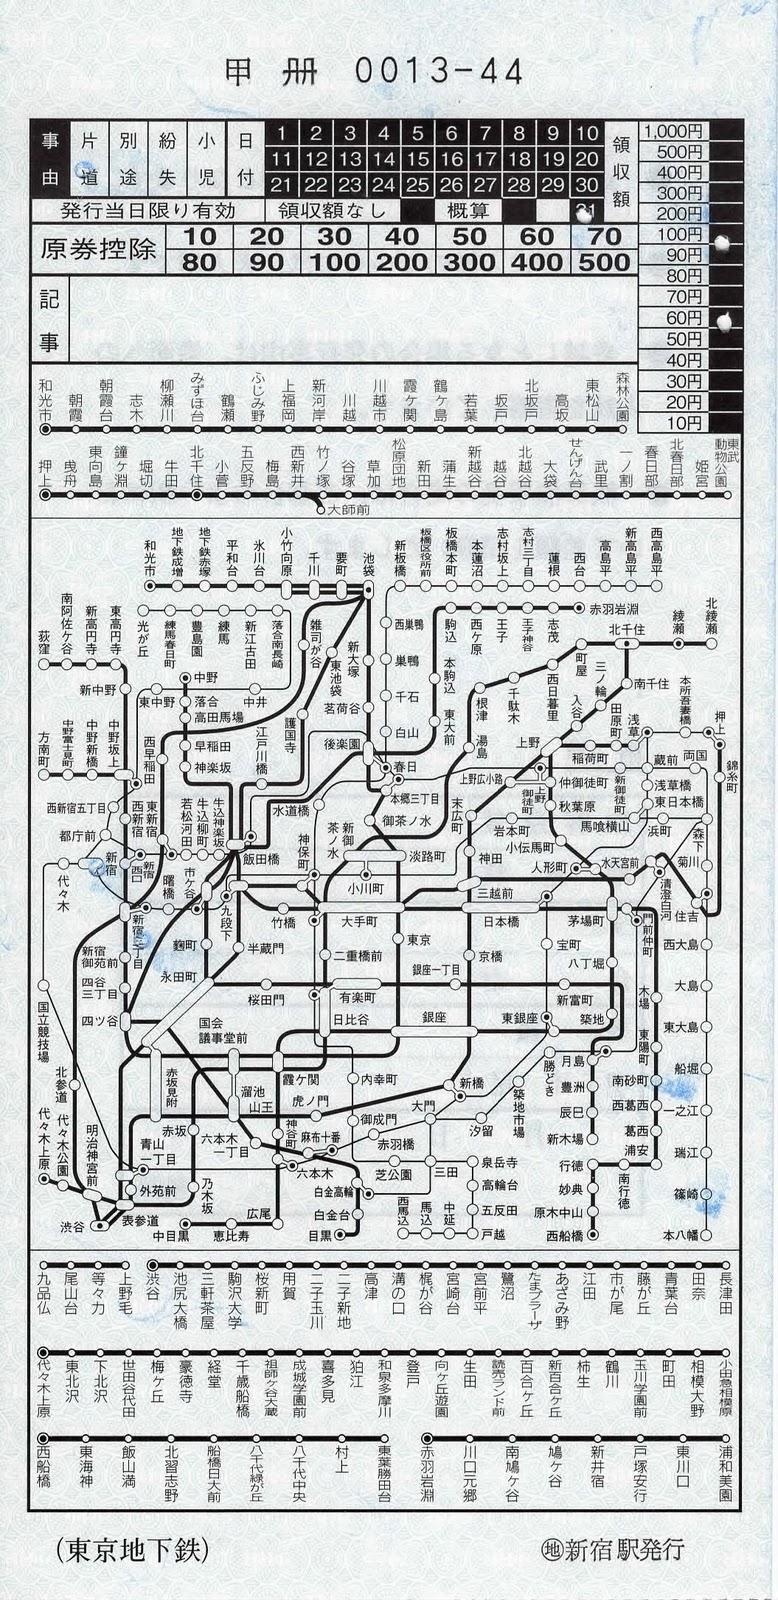 東京メトロ 地図式補充券30 新宿駅